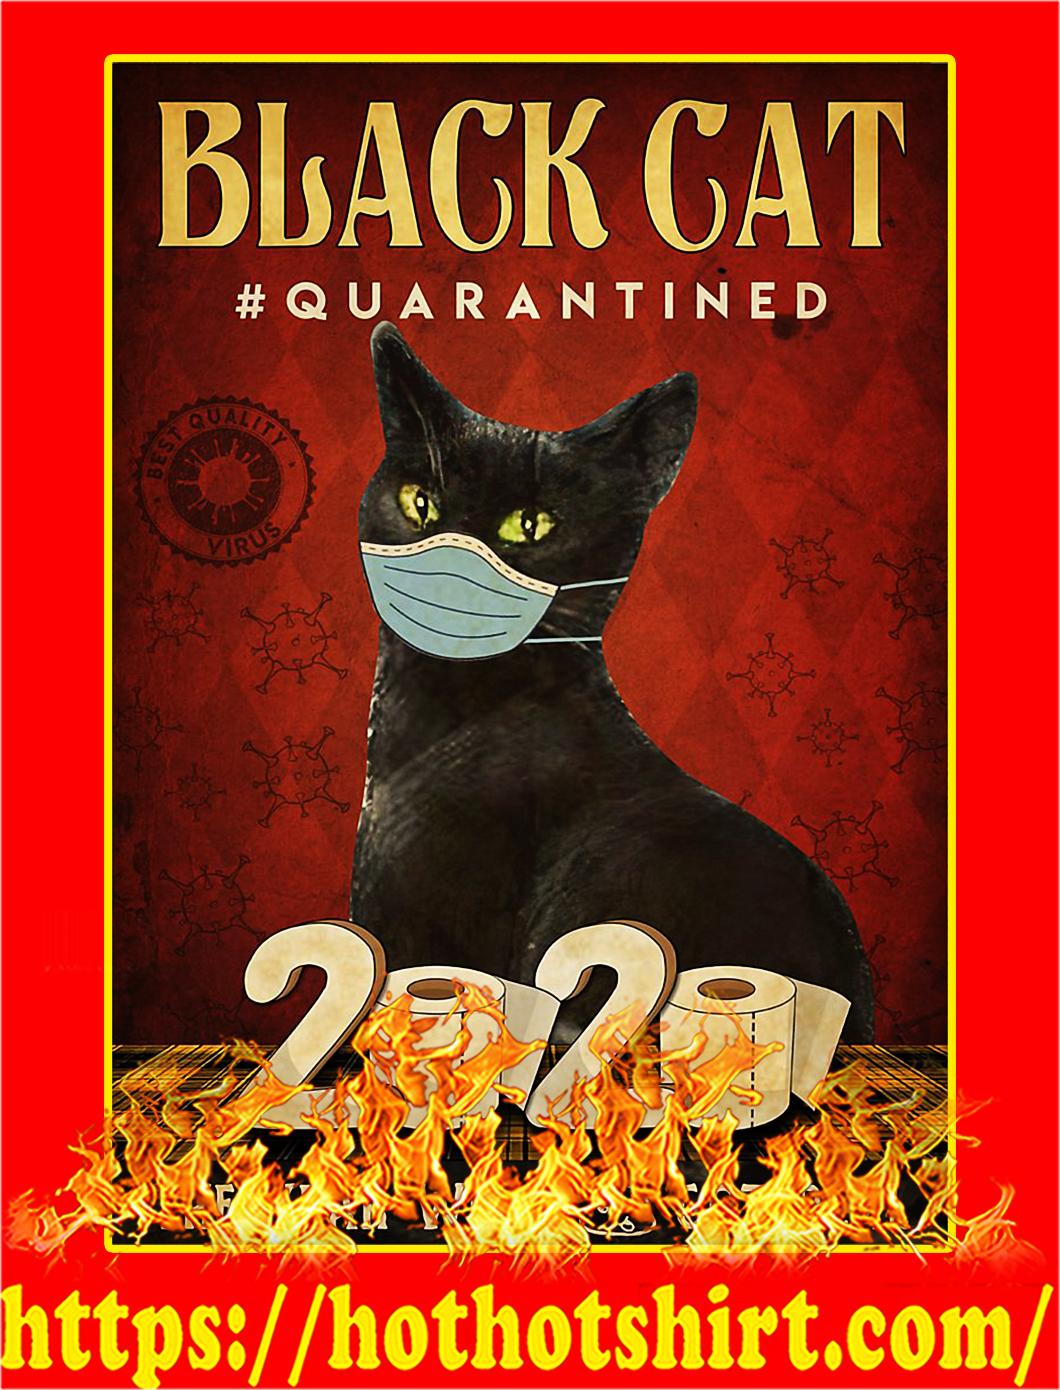 Black cat quarantined 2020 poster - A4